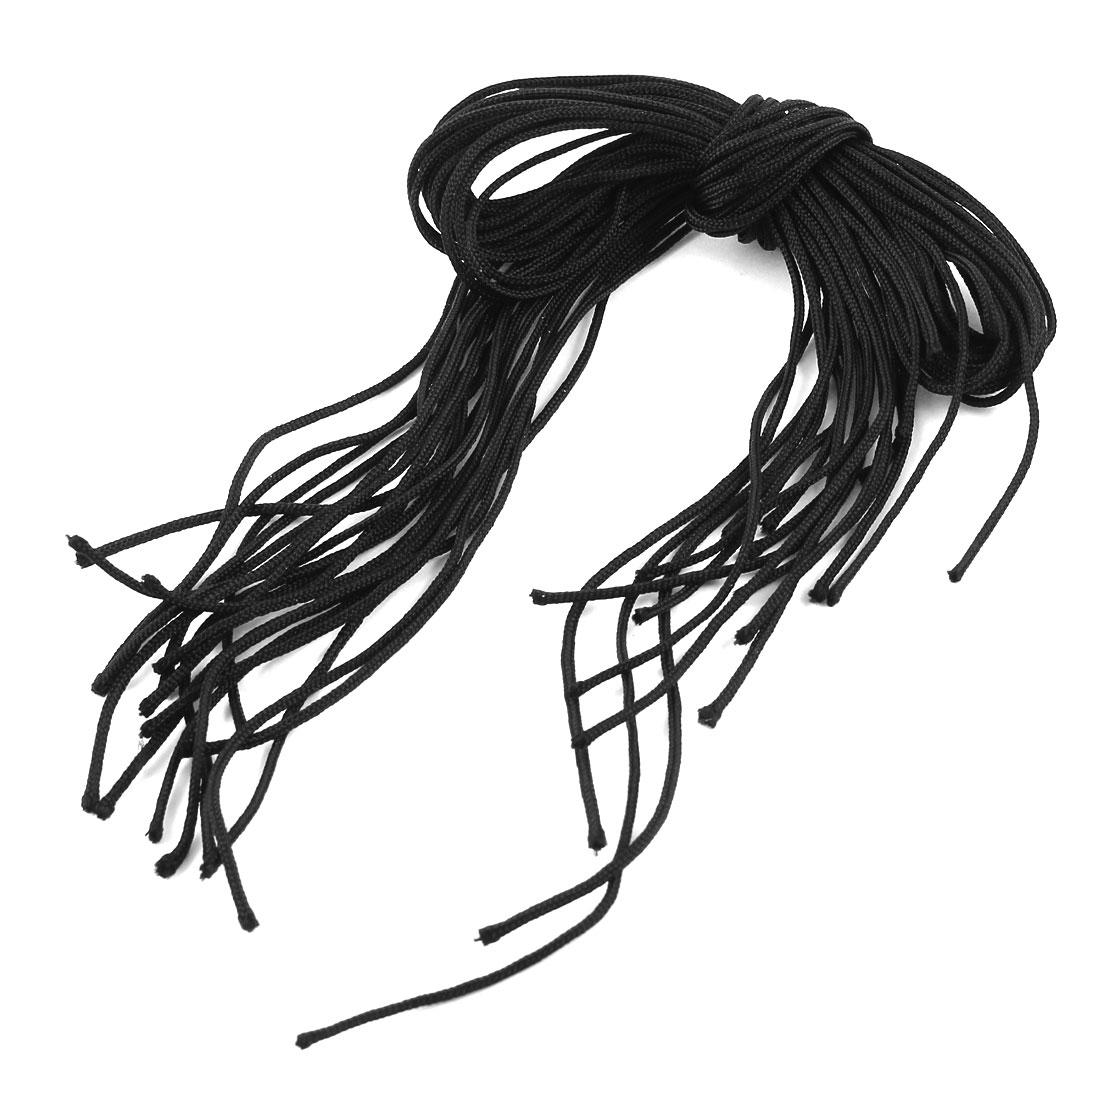 20 Pcs Decorative Art Black Nylon Handwork Chinese Knot Rat Tail Cord String